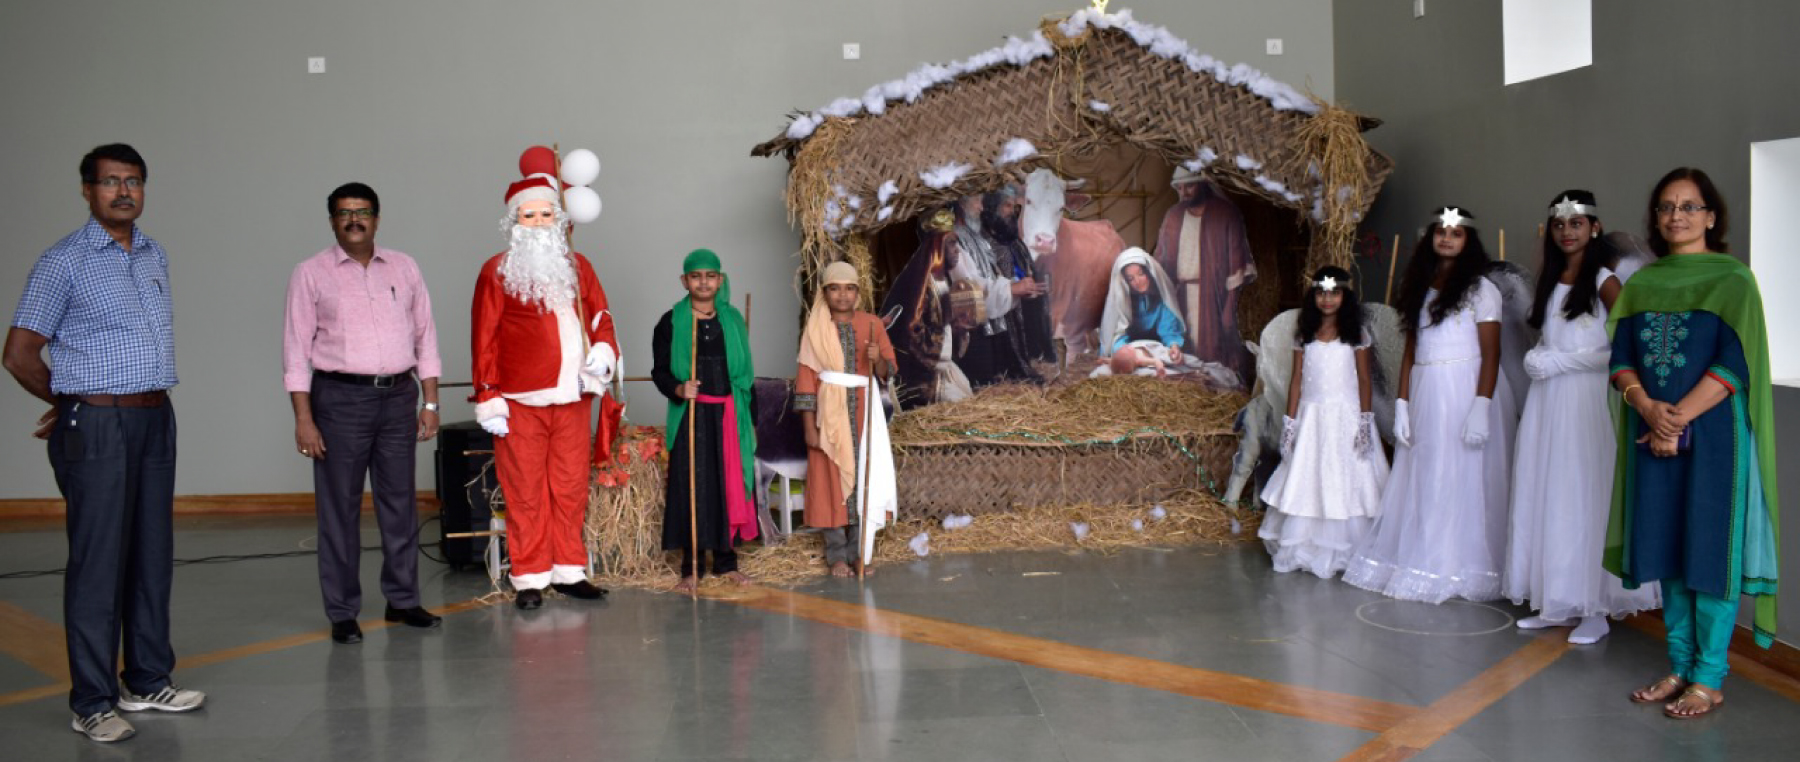 Christmas at ELGi School